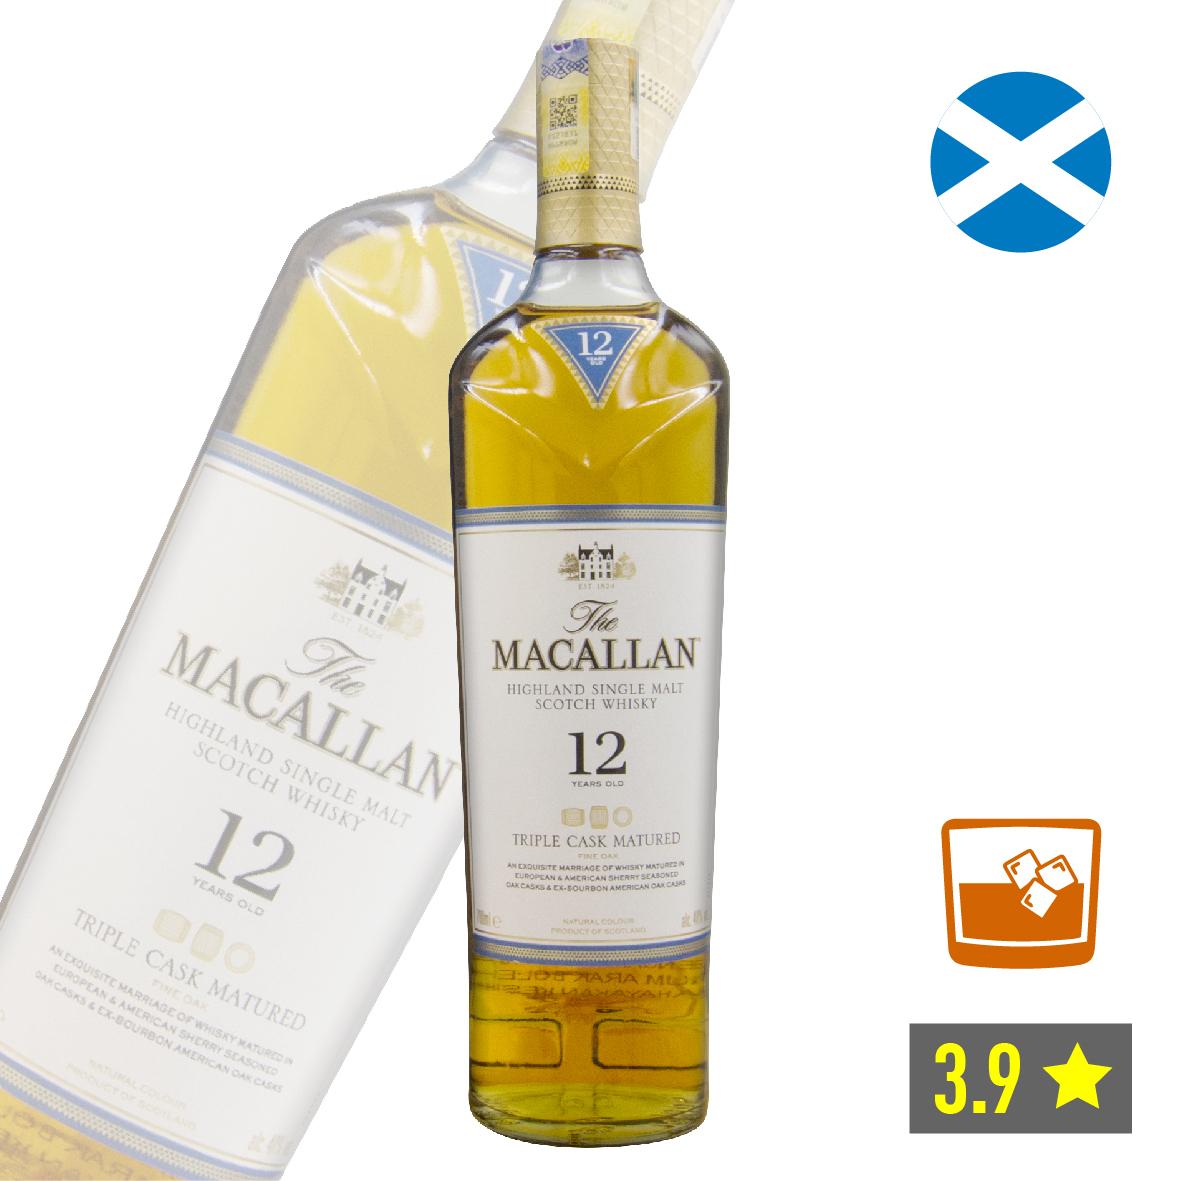 16-THE MACALLAN 12 YEAR SHERRY OAK CASK(Scotland)-01.jpg